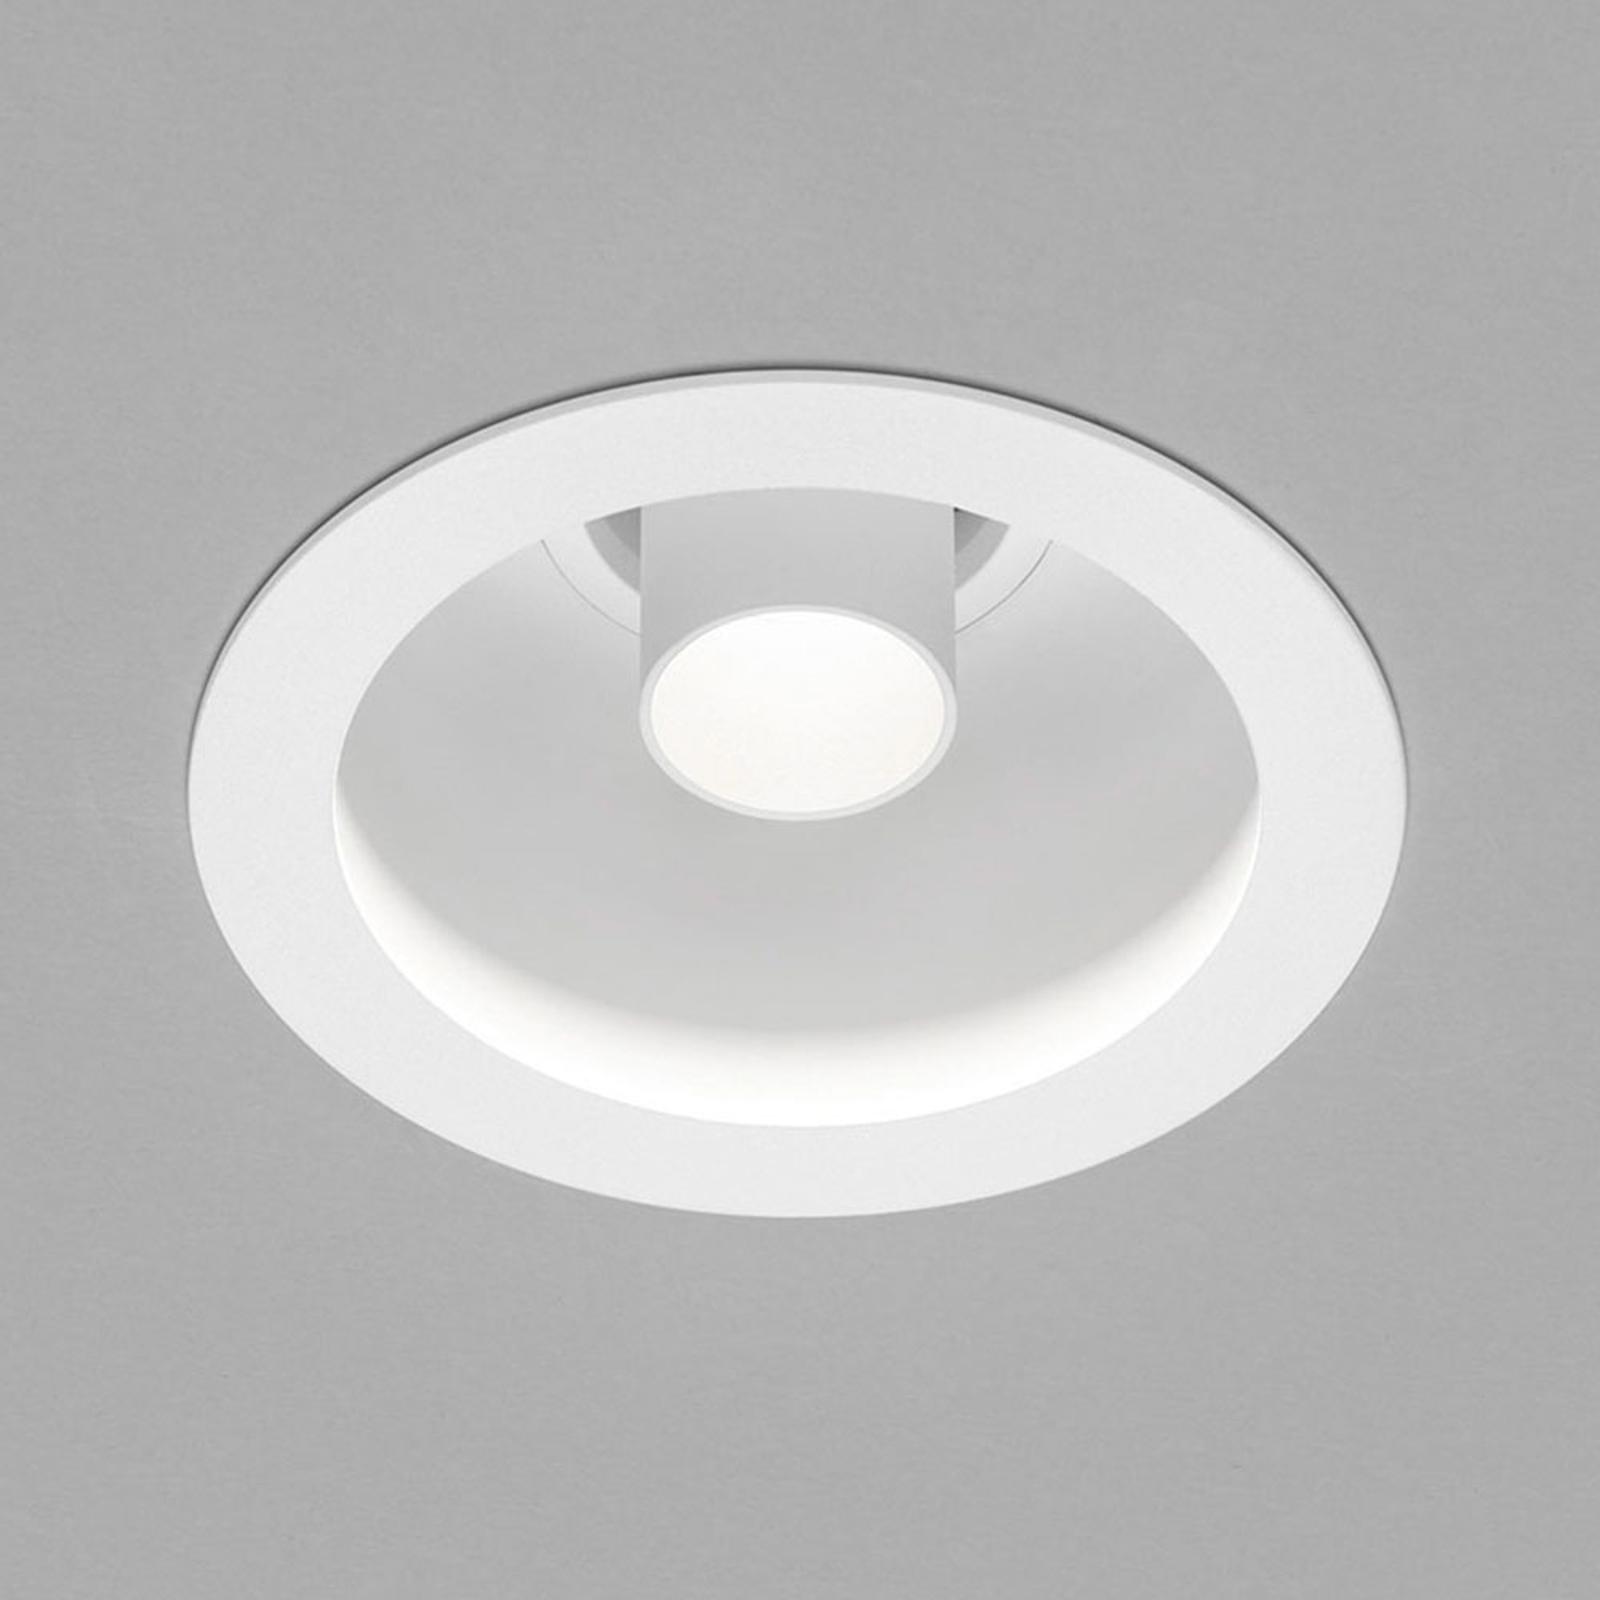 Helestra Run LED inbouwspot 1-lamp, wit/wit